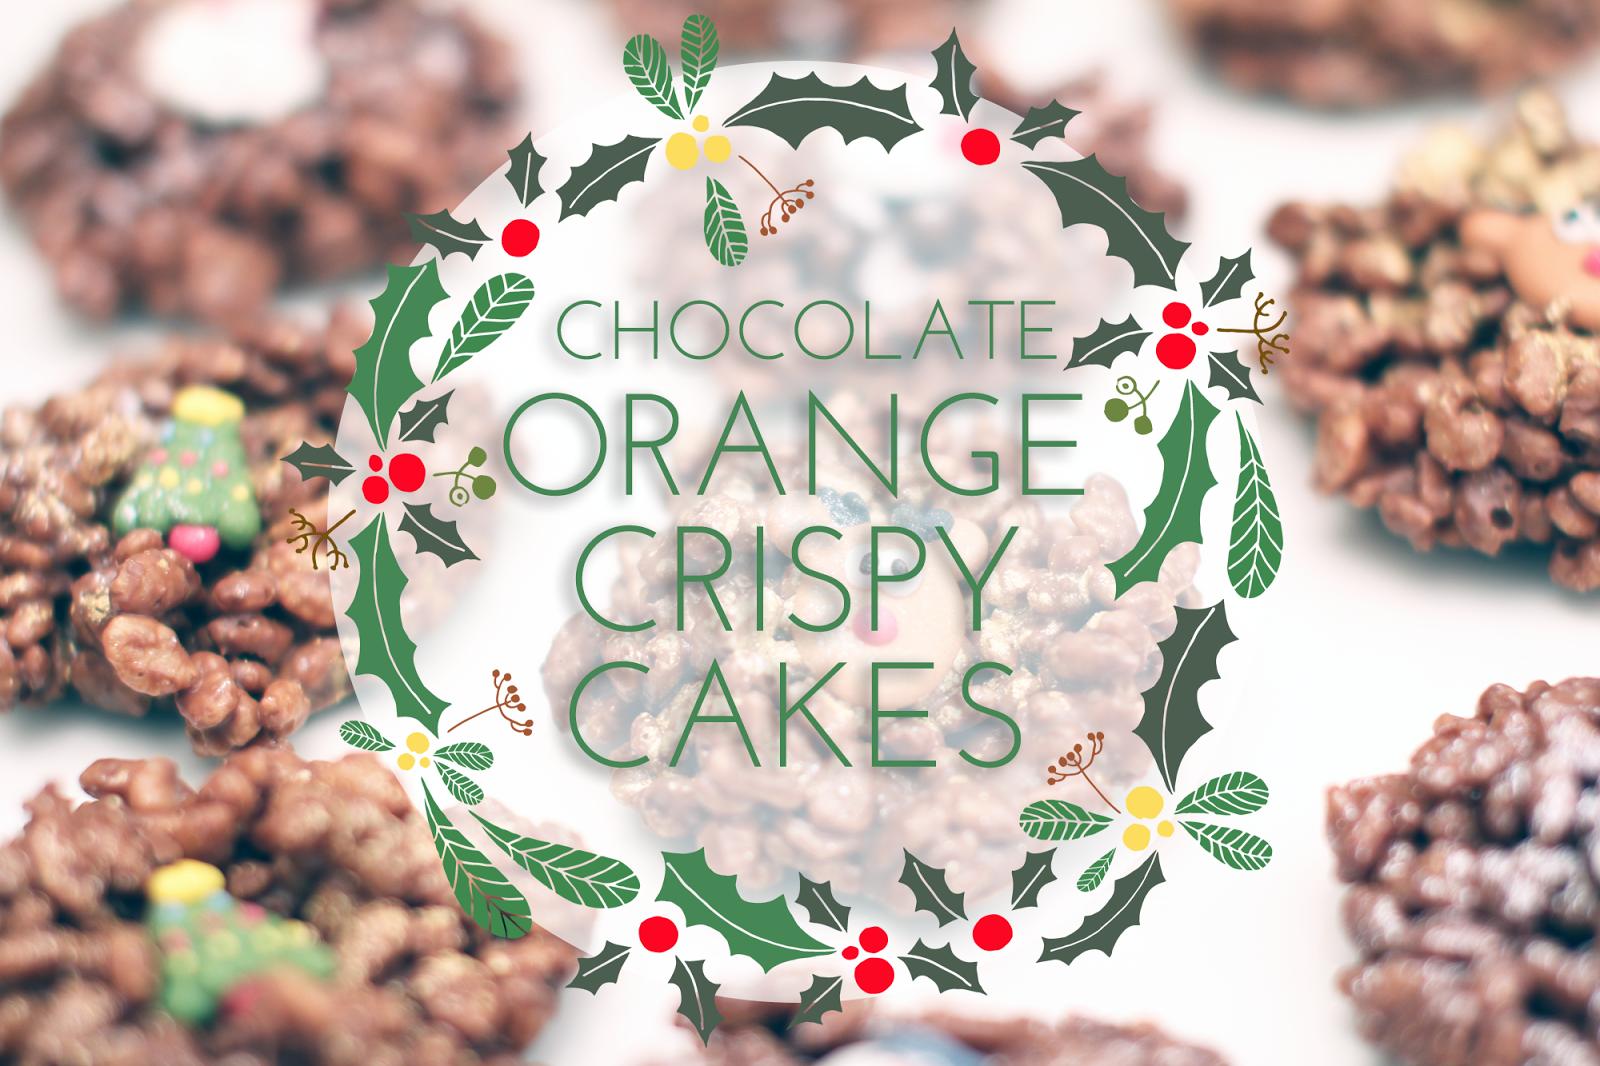 melissa-lou: Chocolate Orange Crispy Cakes